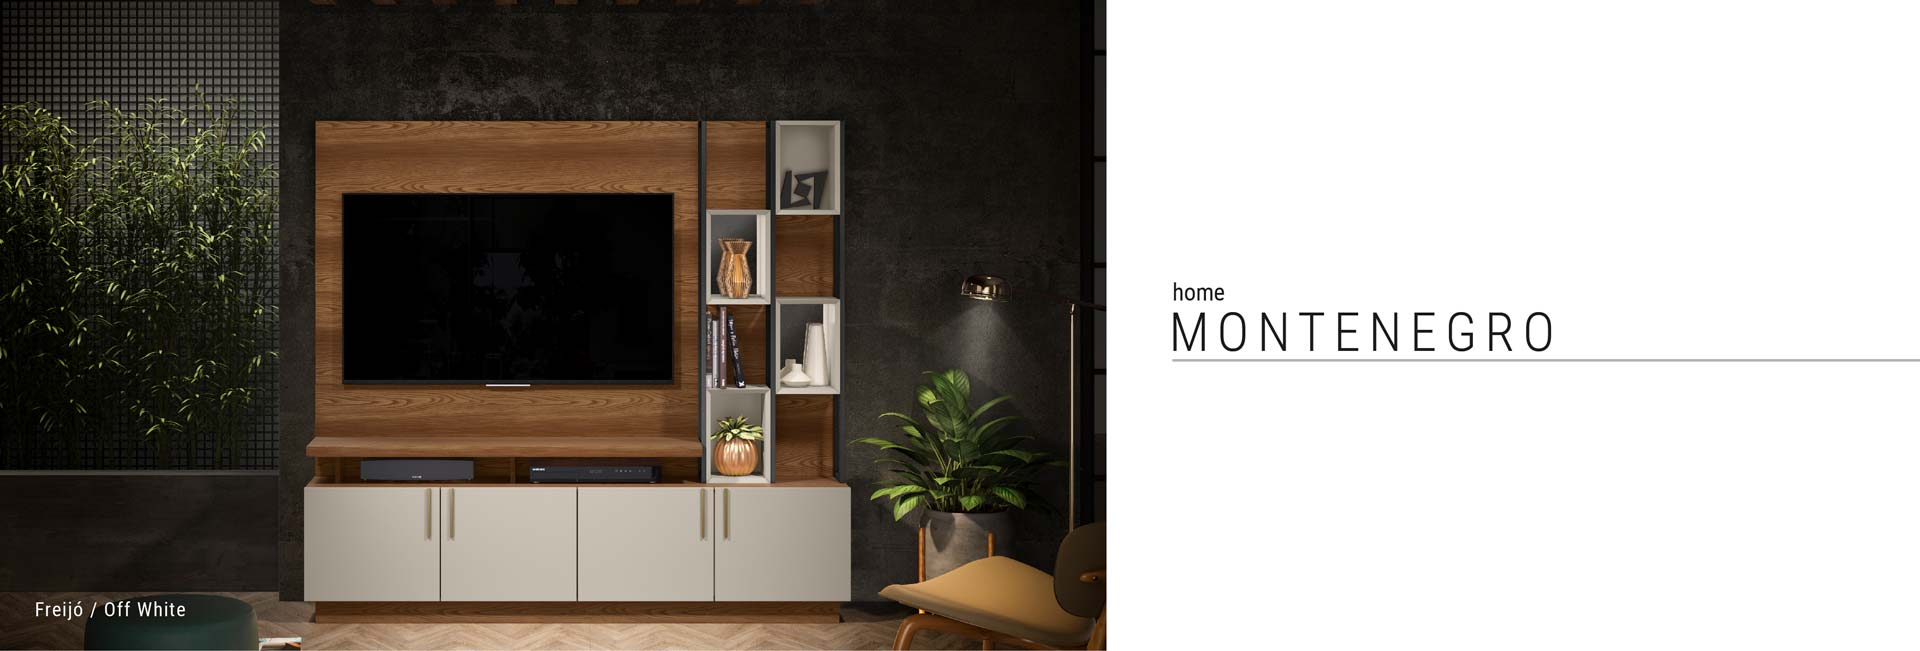 Home para TV Montenegro